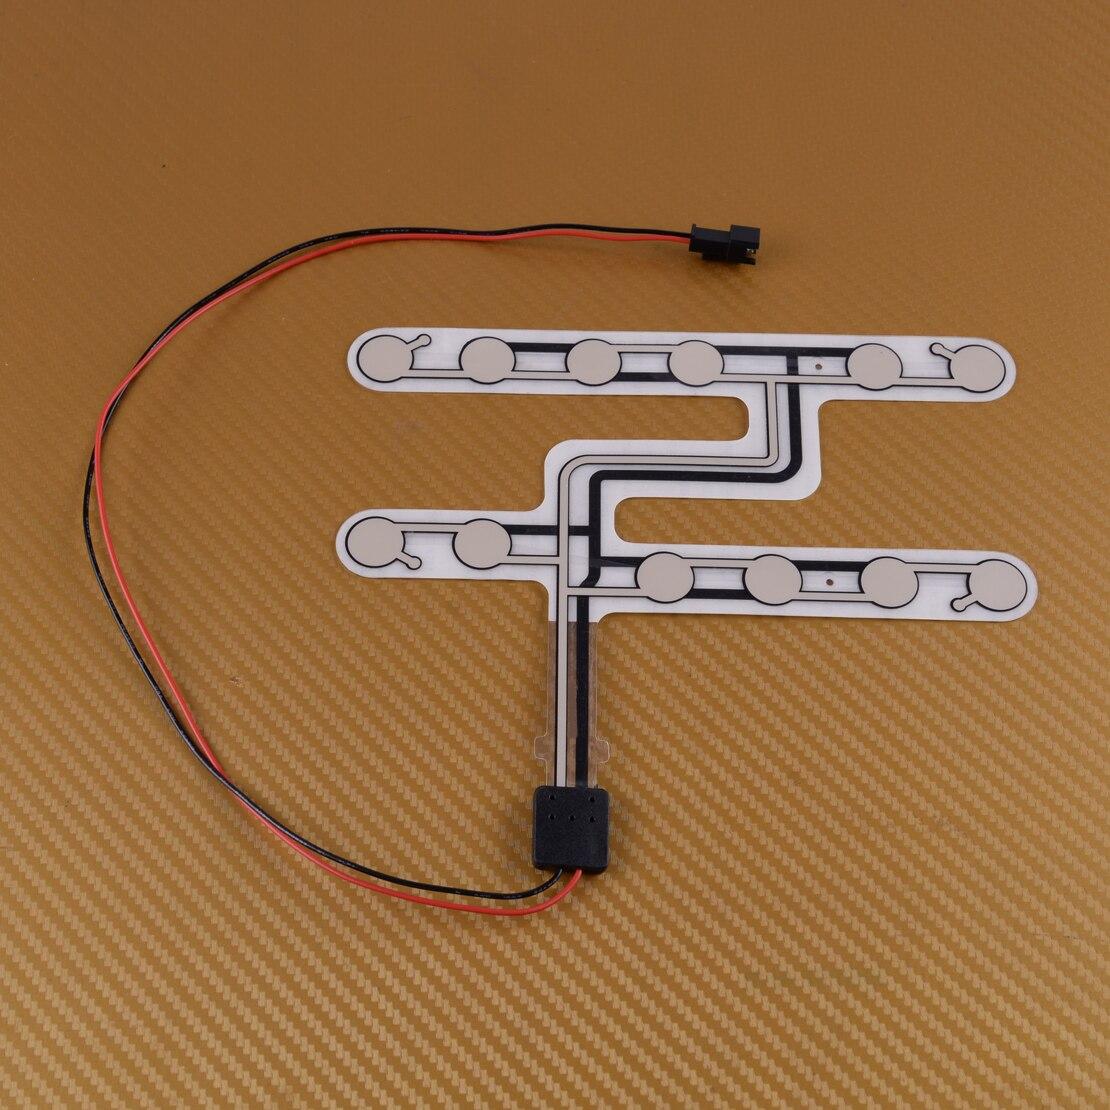 Citall Mobil Universal Sensor Tekanan Safety Belt Aksesori Peringatan Pengingat Pad Sibuk Duduk Alarm title=